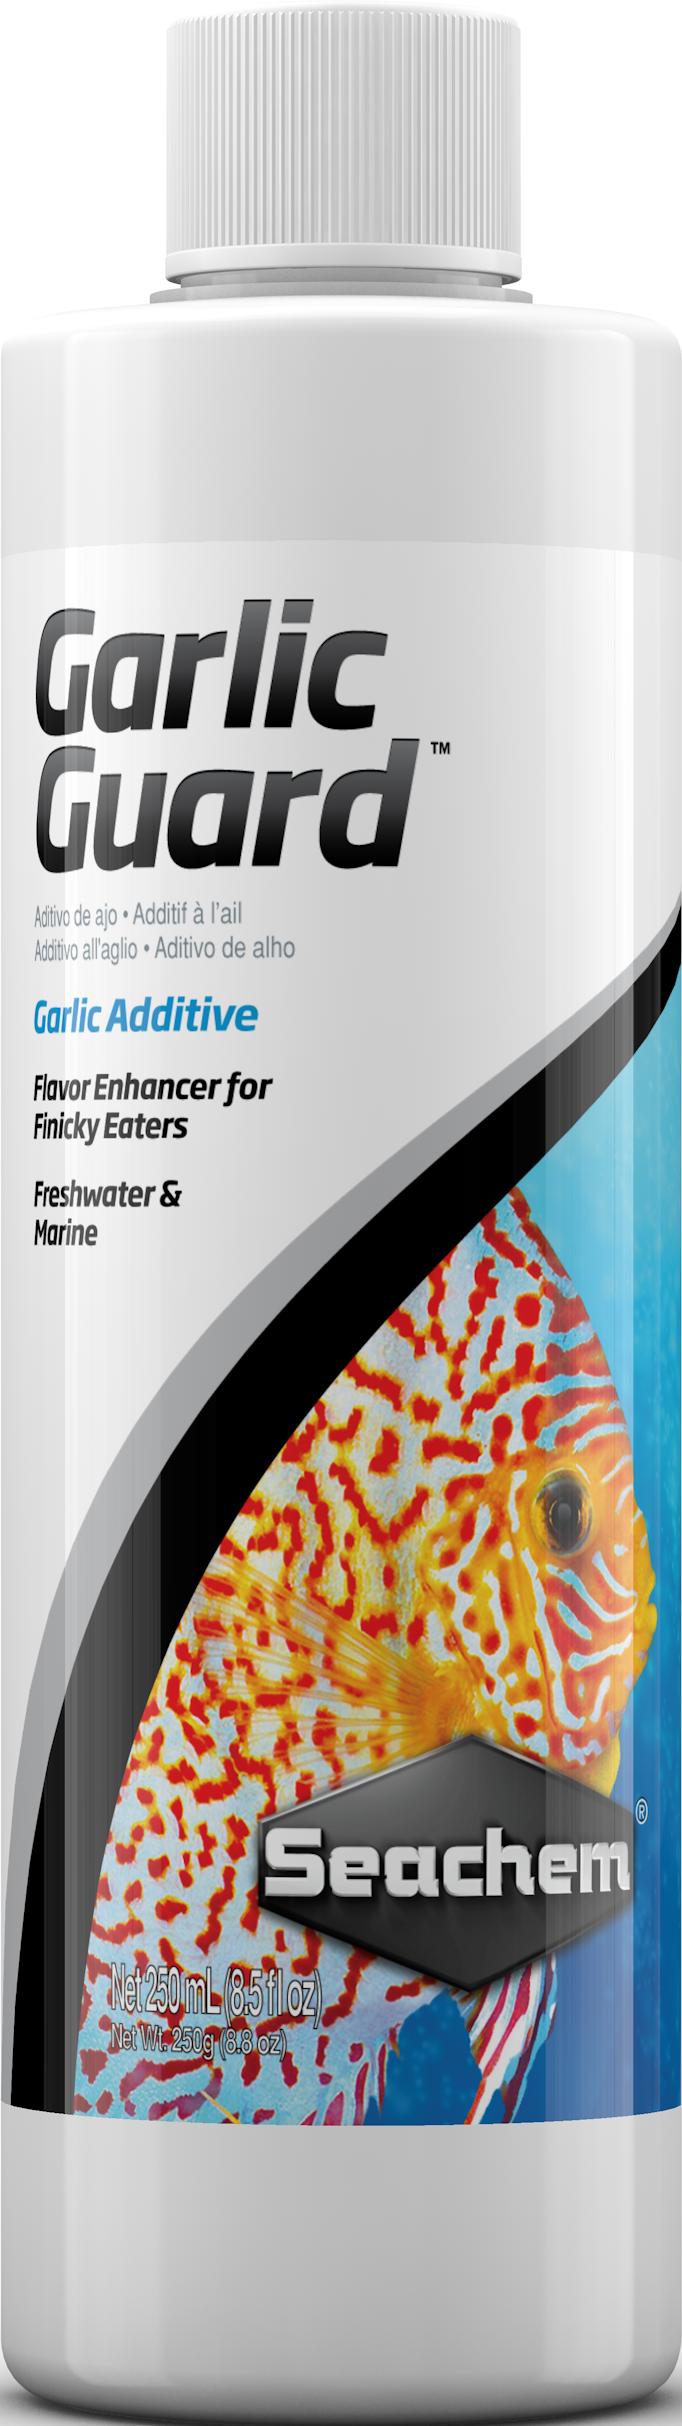 Seachem GarlicGuard Flavor Enhancer for Marine & Freshwater Aquariums, 8.5-oz Bottle